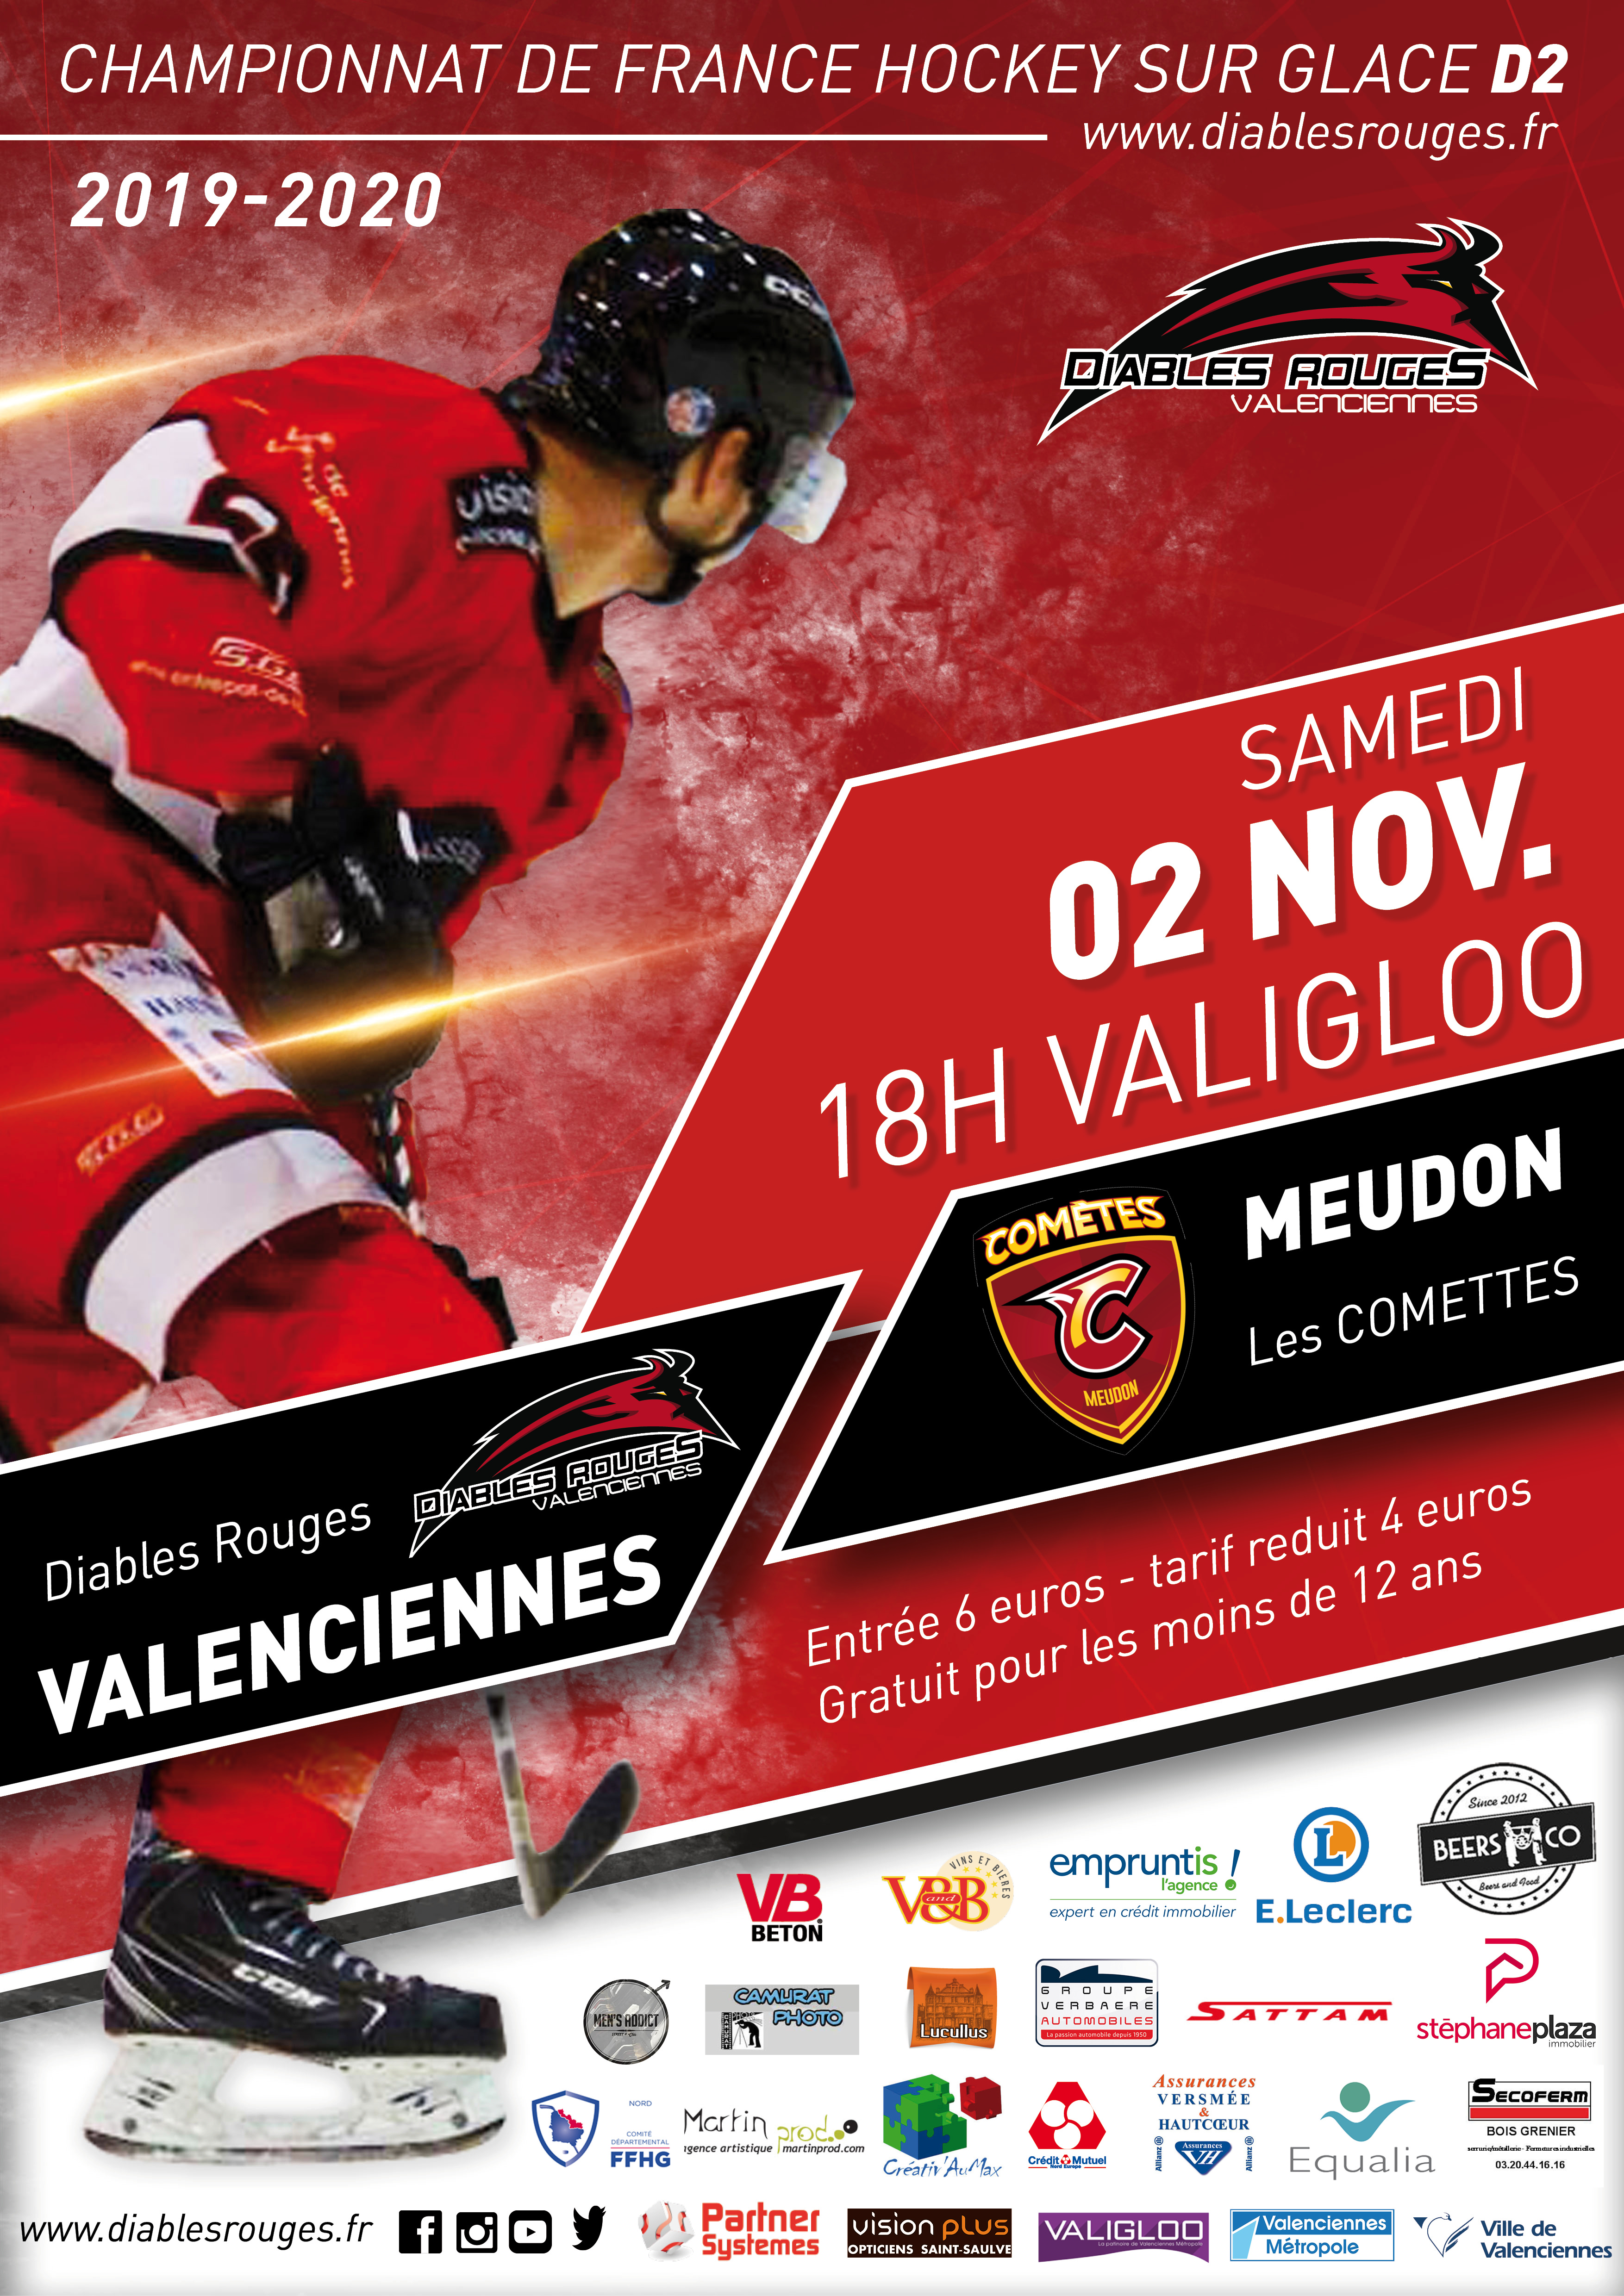 Valenciennes reçoit Meudon ce samedi 02 novembre 2019